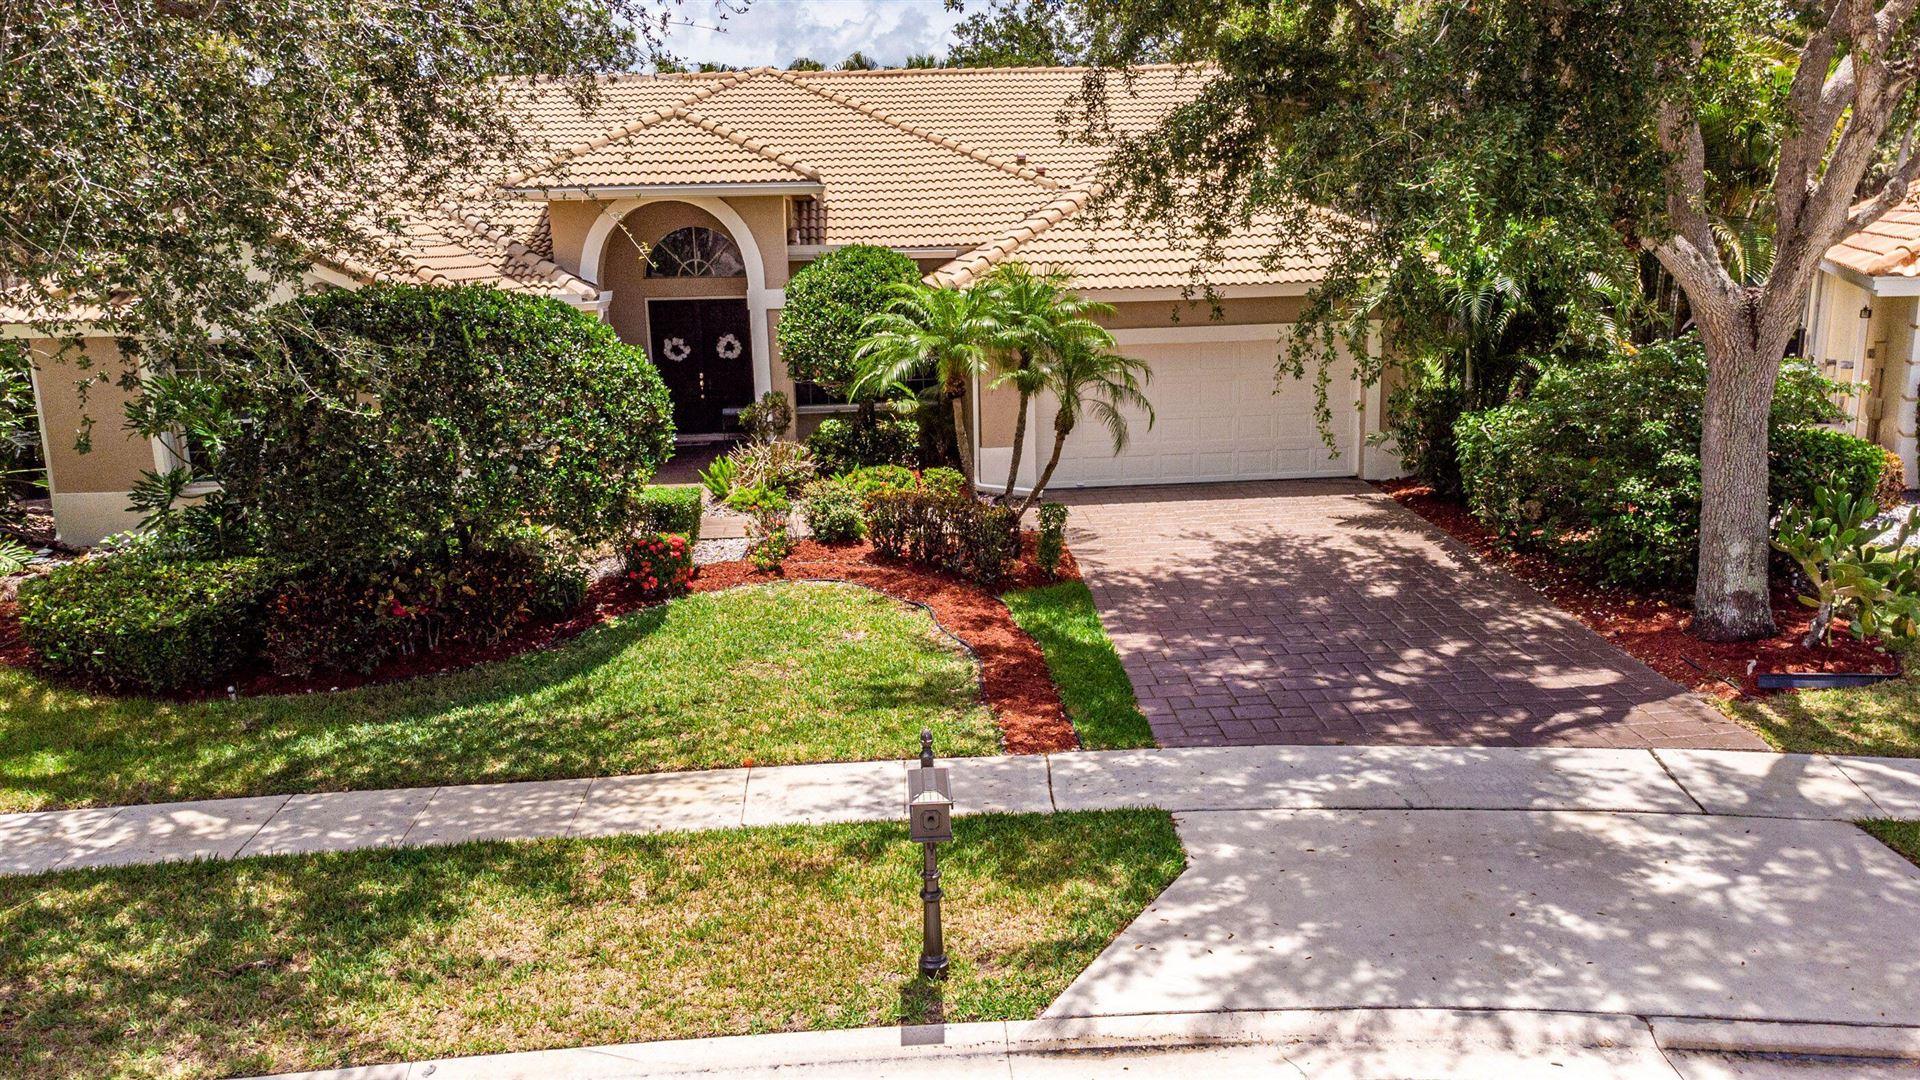 7636 Dorchester Road, Boynton Beach, FL 33472 - #: RX-10721799